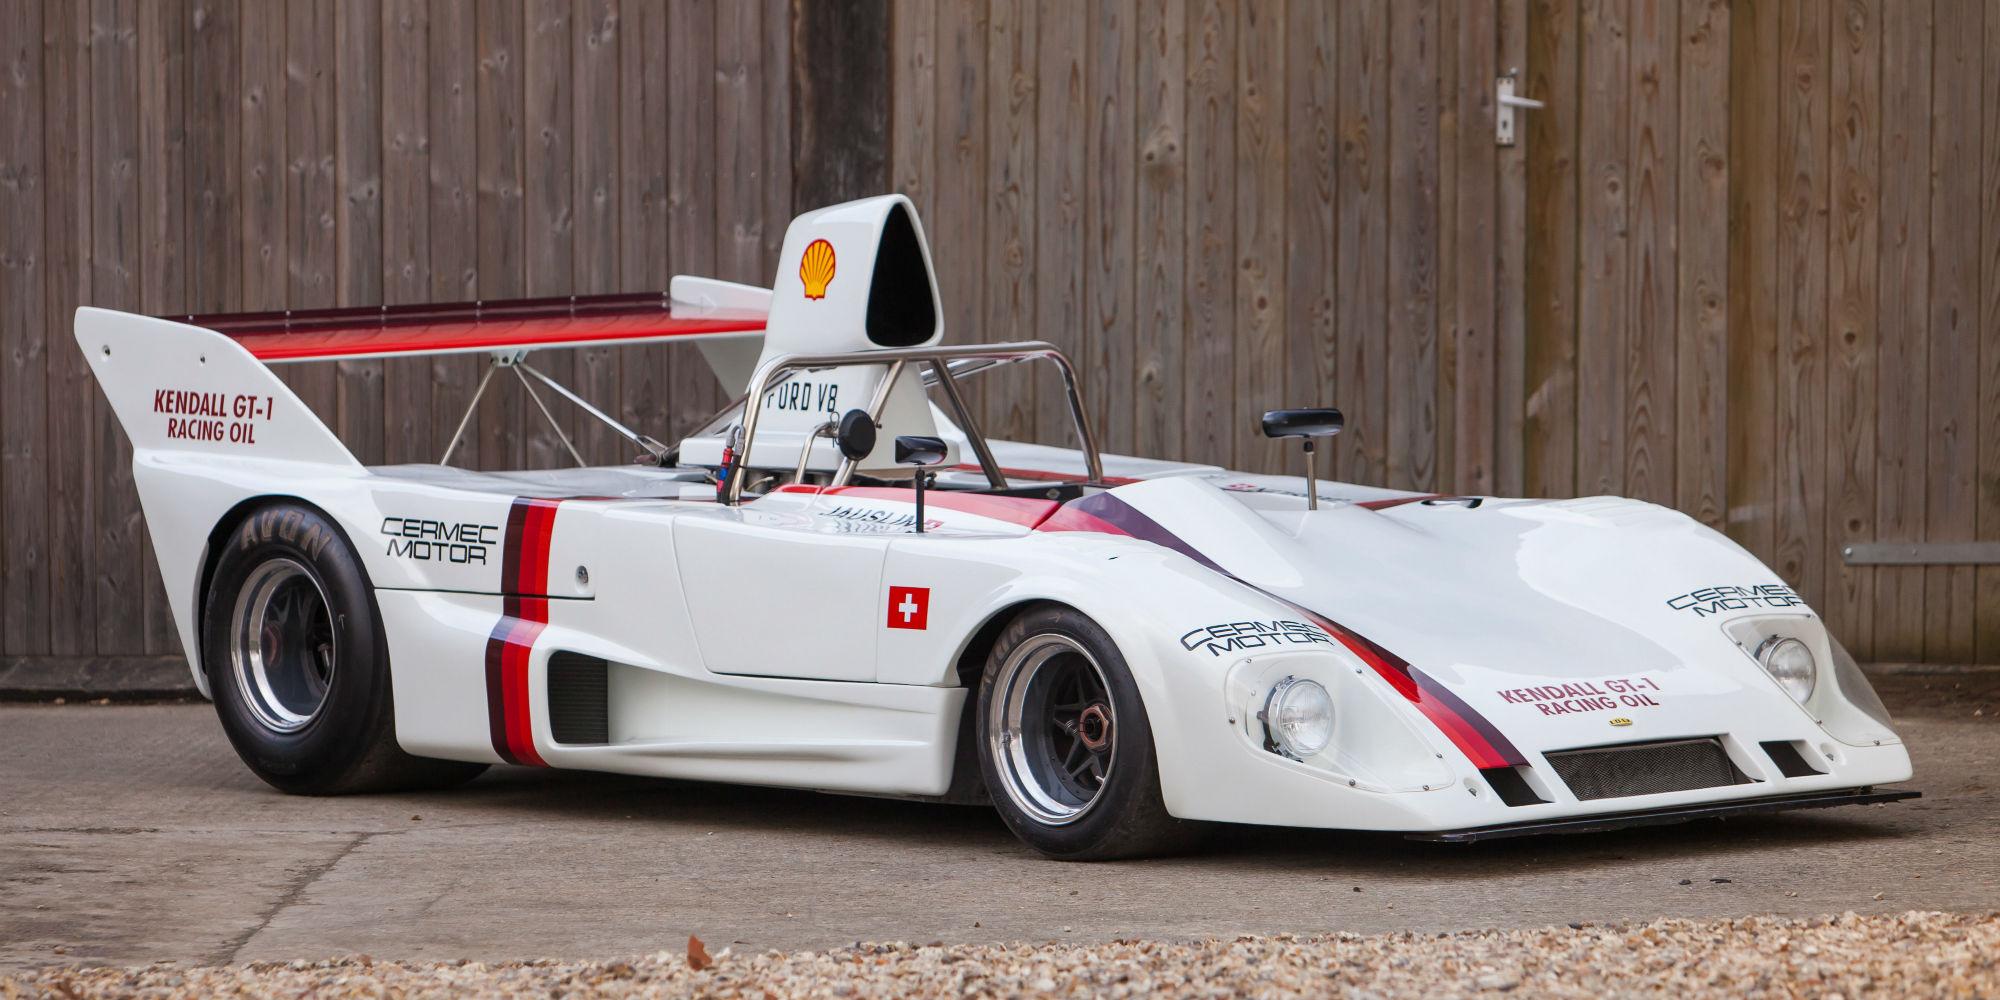 The Ex – Walter Lehmann, Ruedi Jauslin, Rosso Bianco Collection 1973 Lola T292 DFV